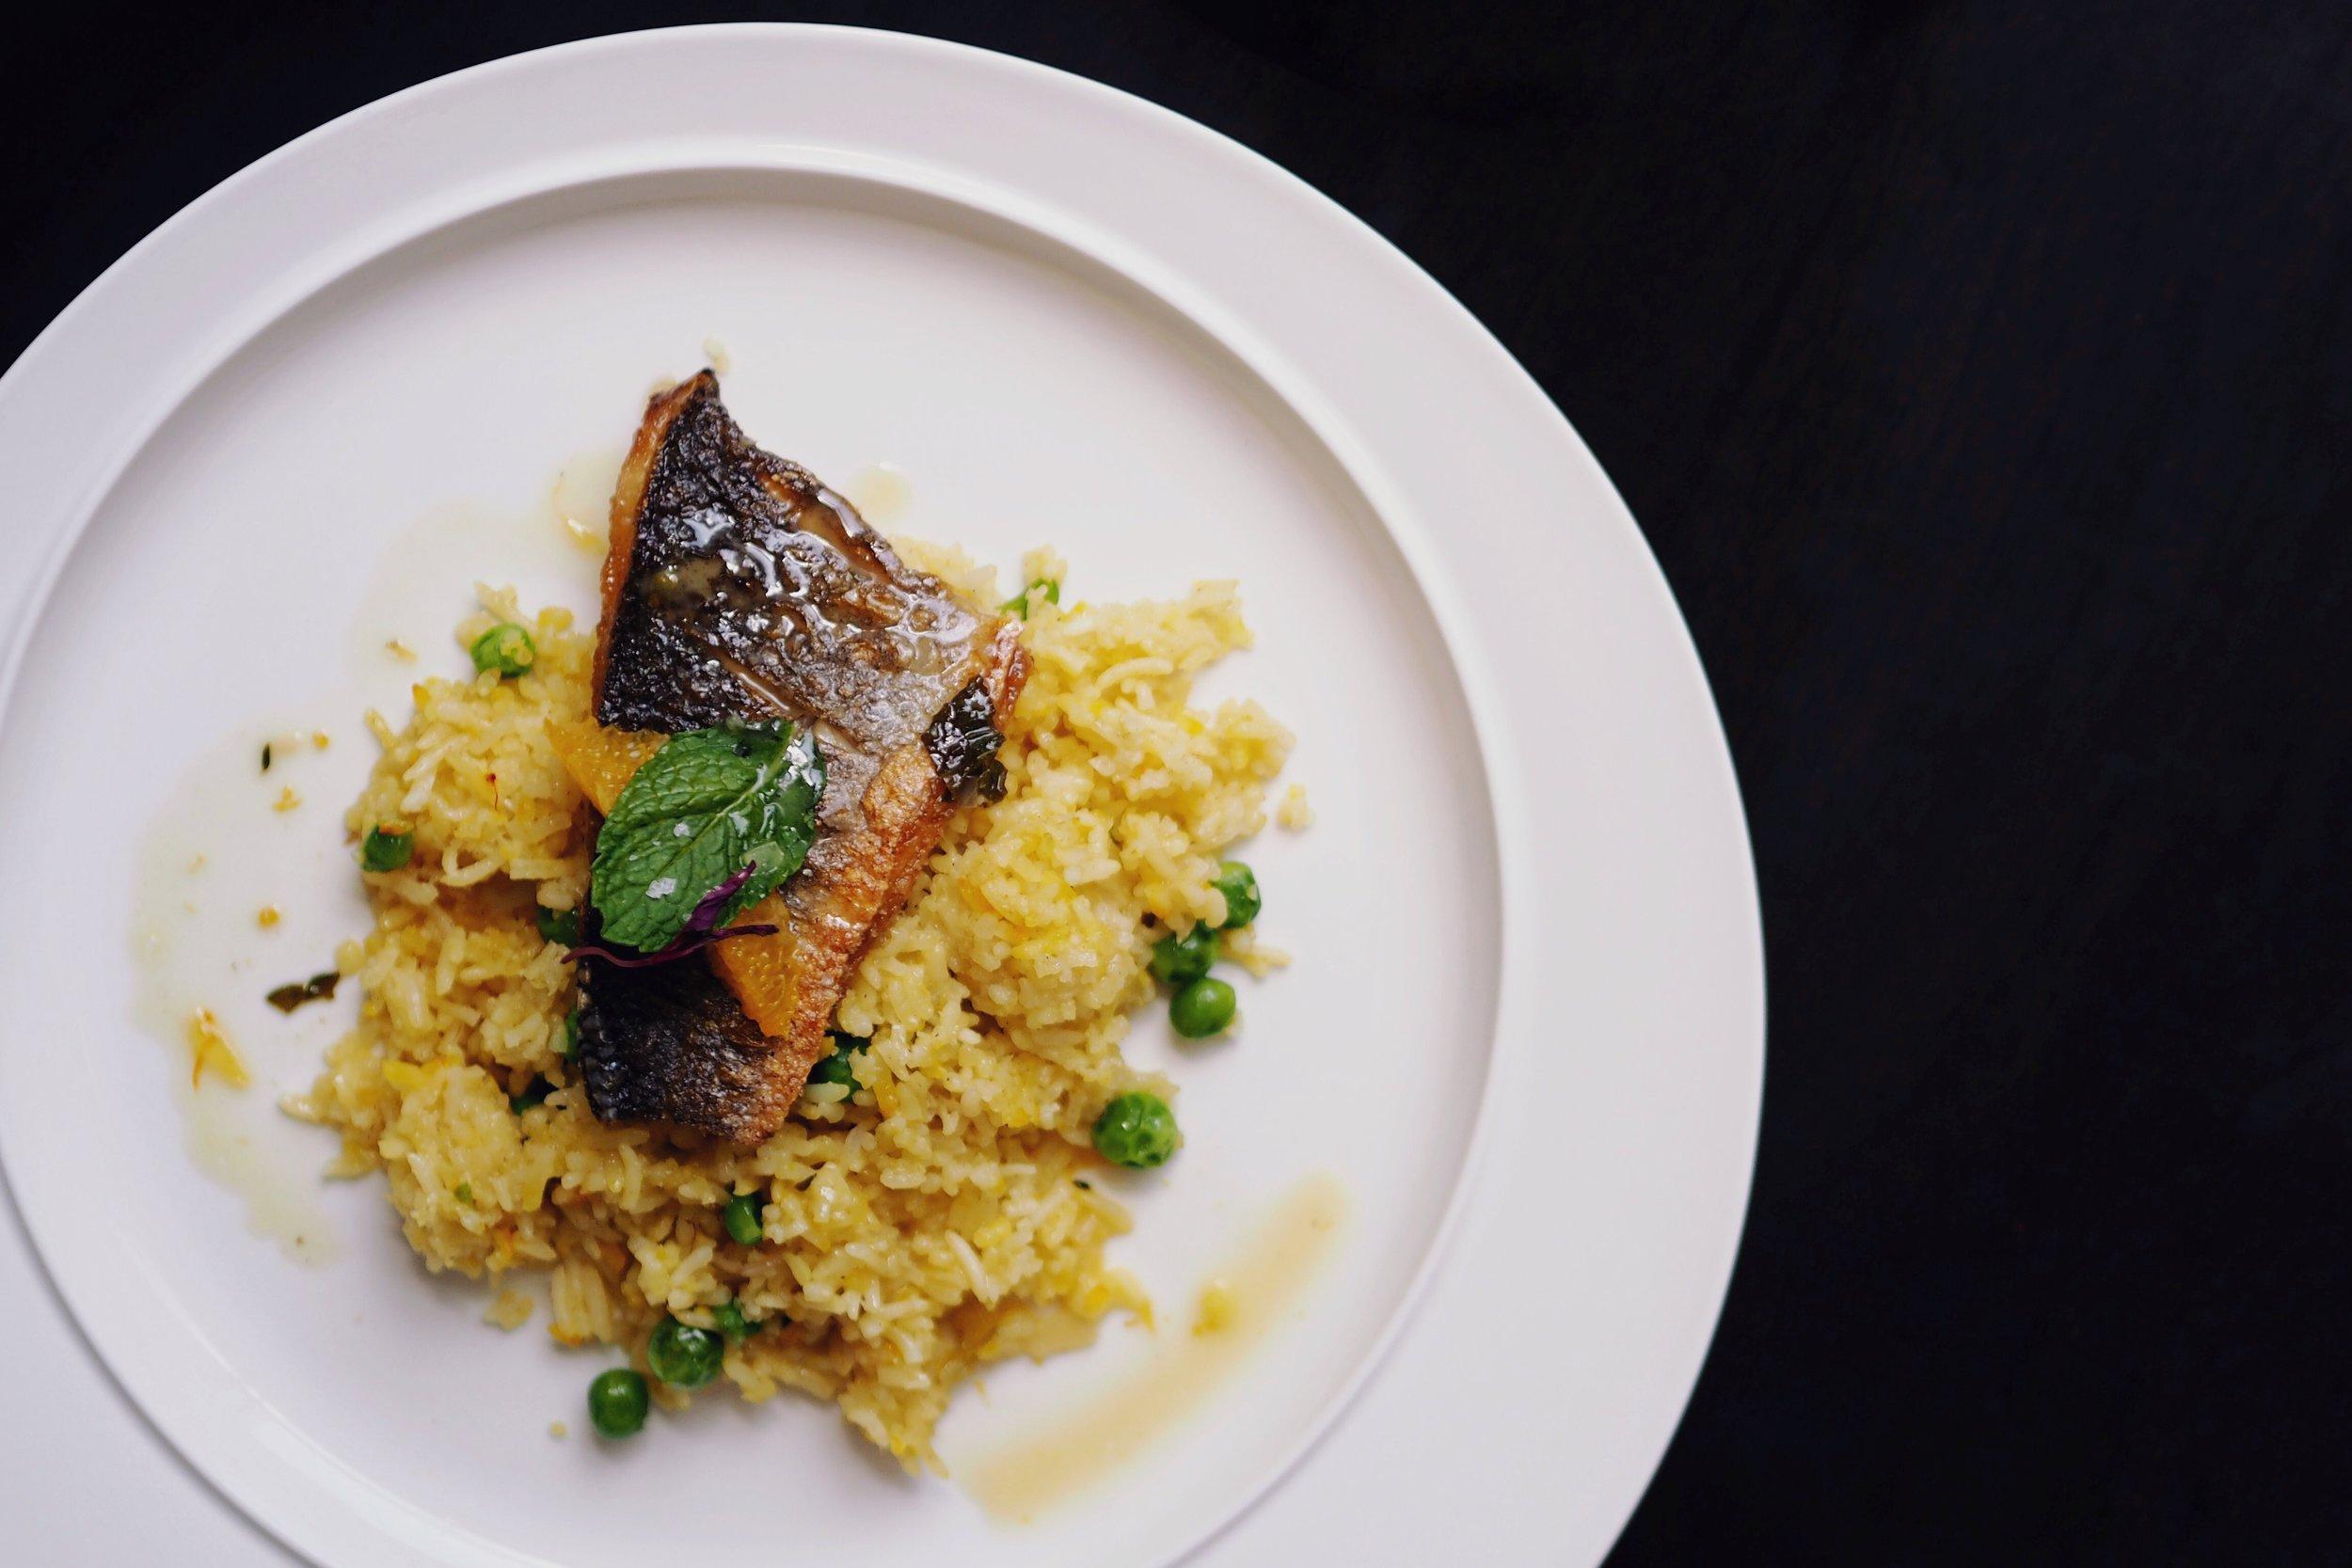 Pan Fried Fish with Saffron Rice